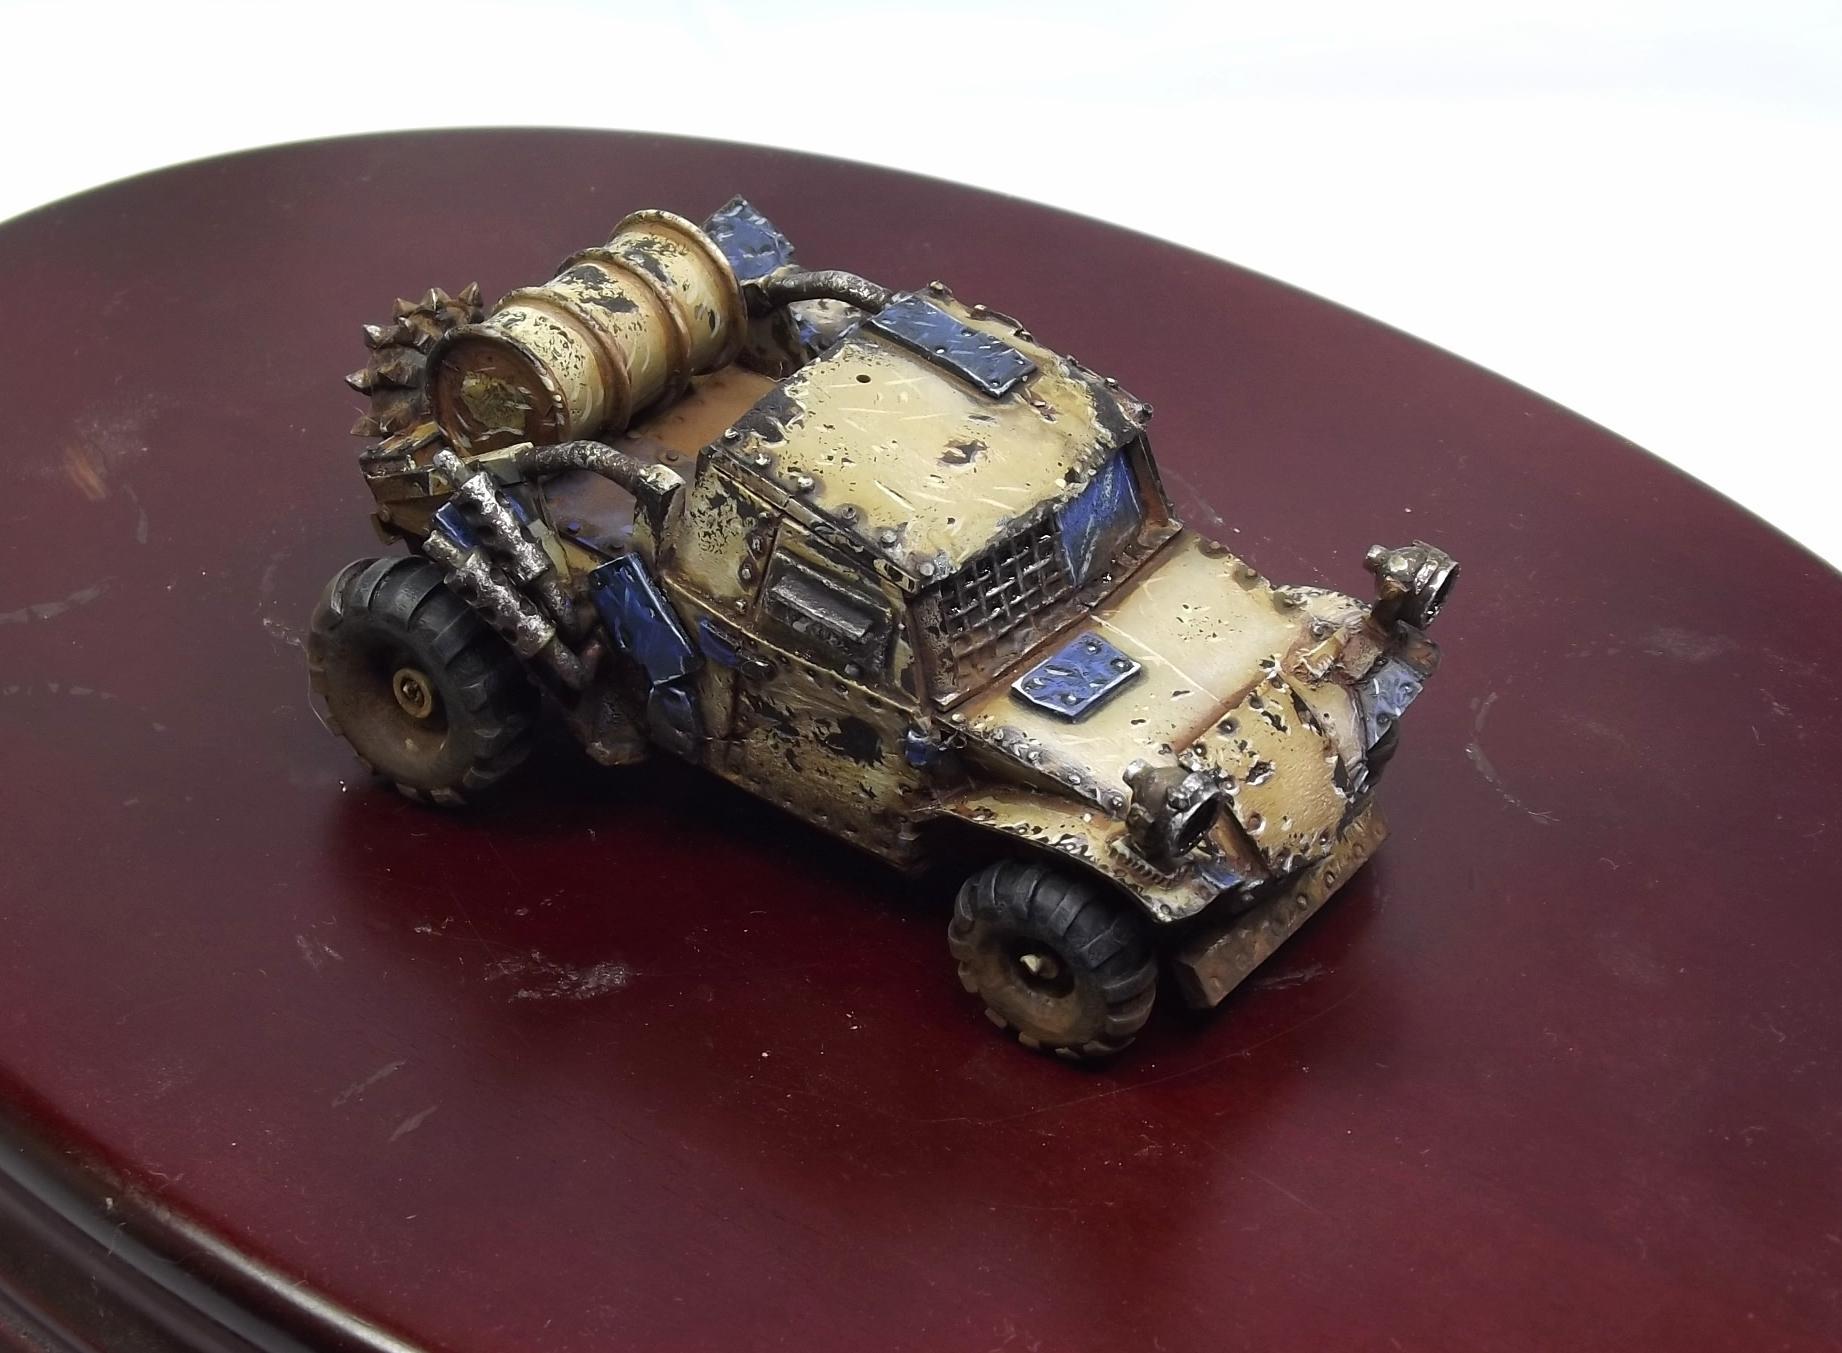 Buggy, Hummer, Jeep, Orks, Puppets Of War